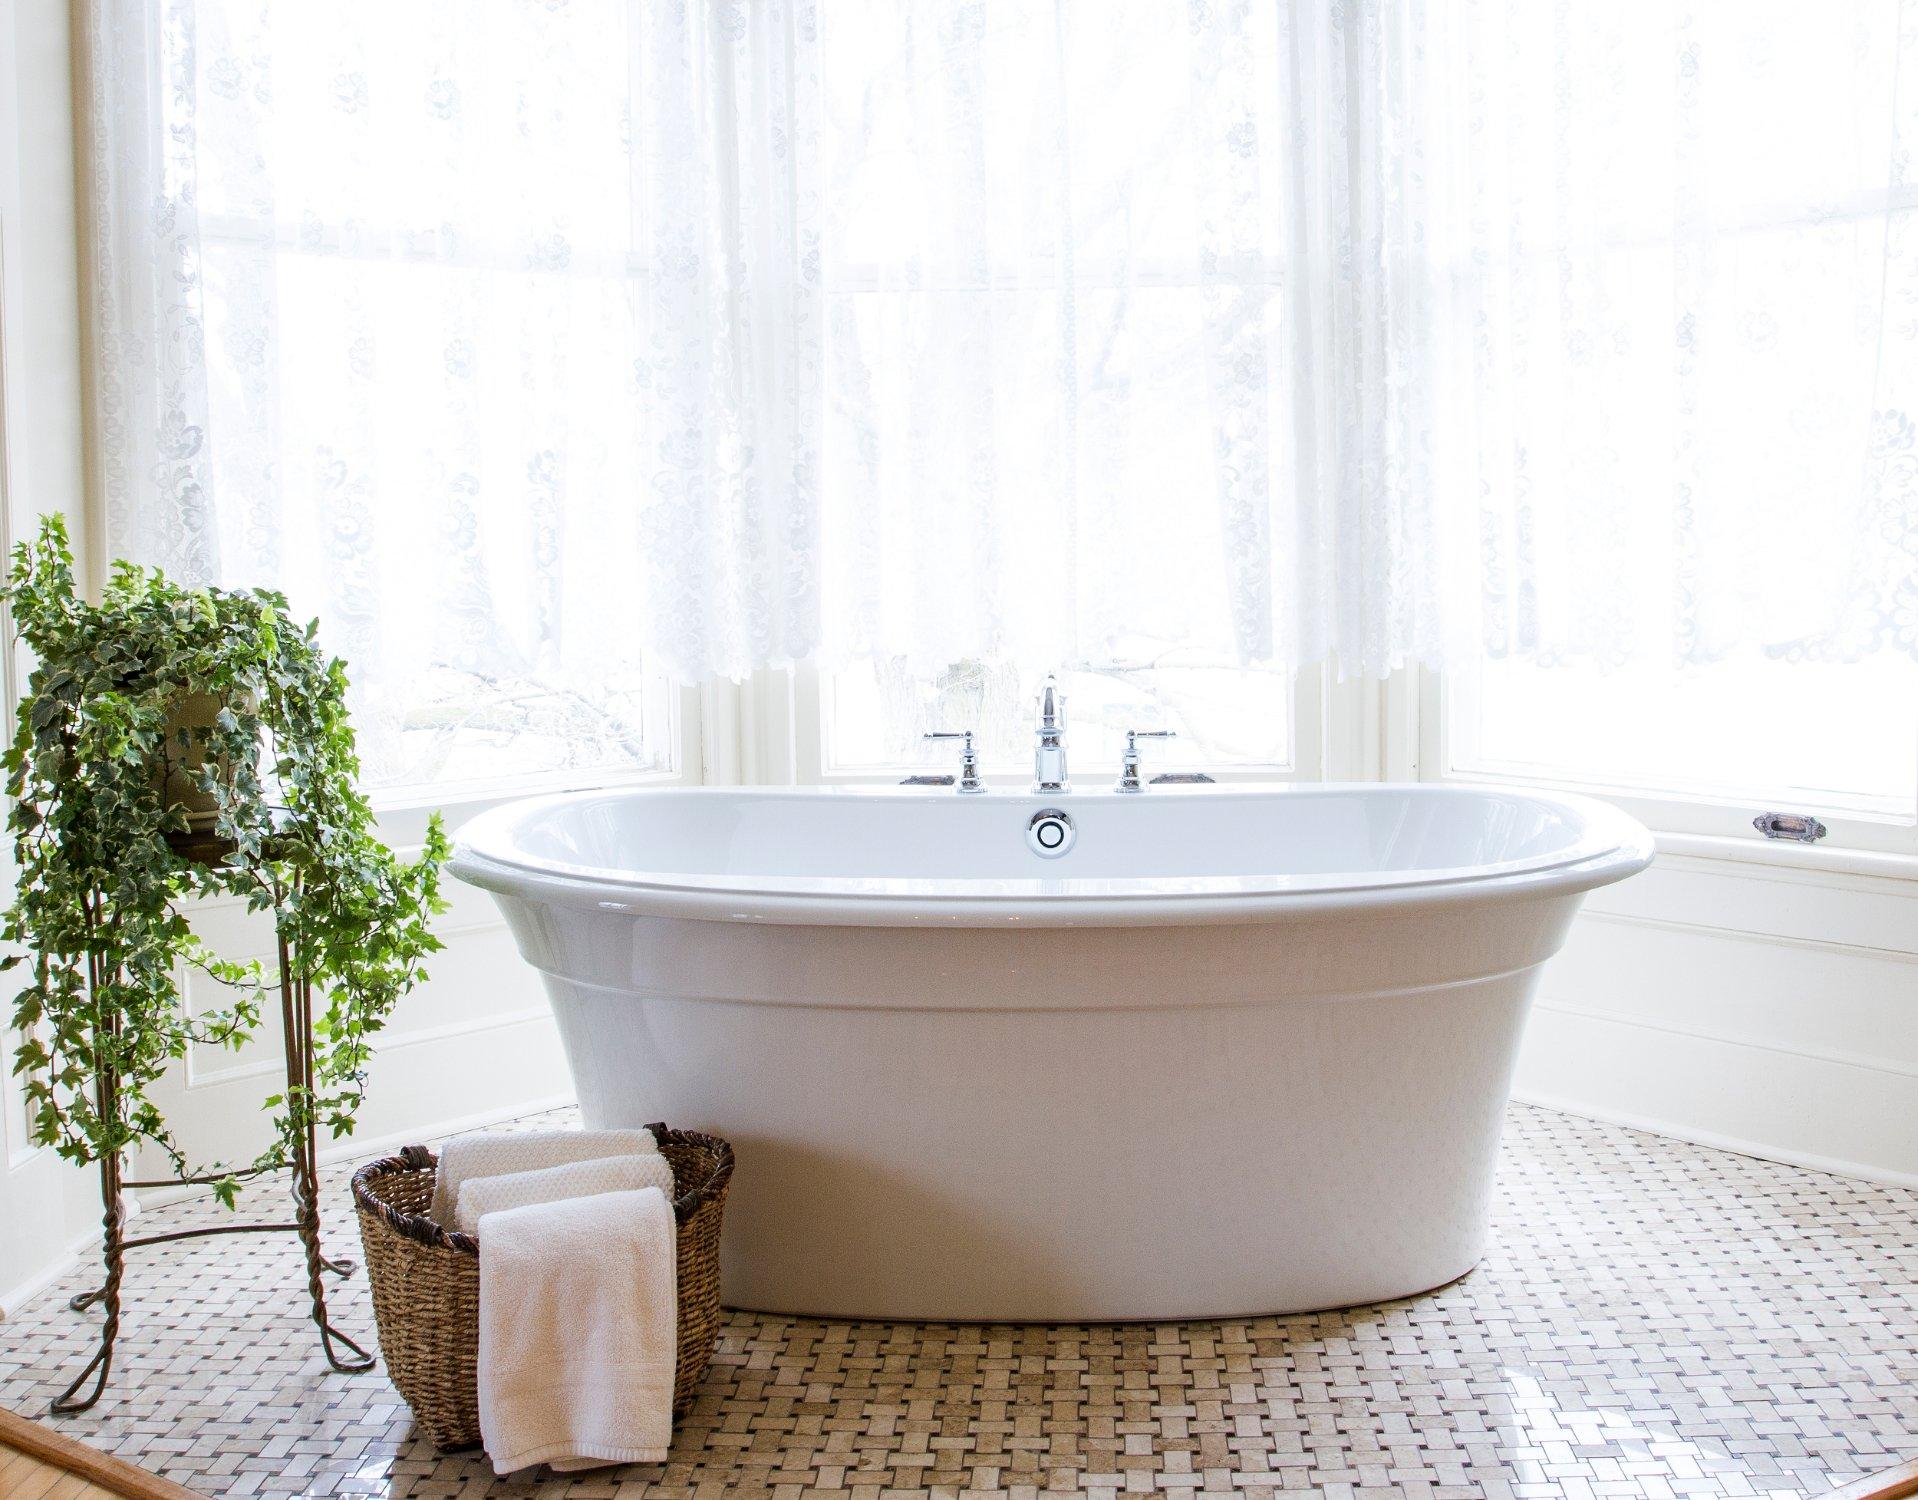 soaking-tub-in-the-lady.jpg